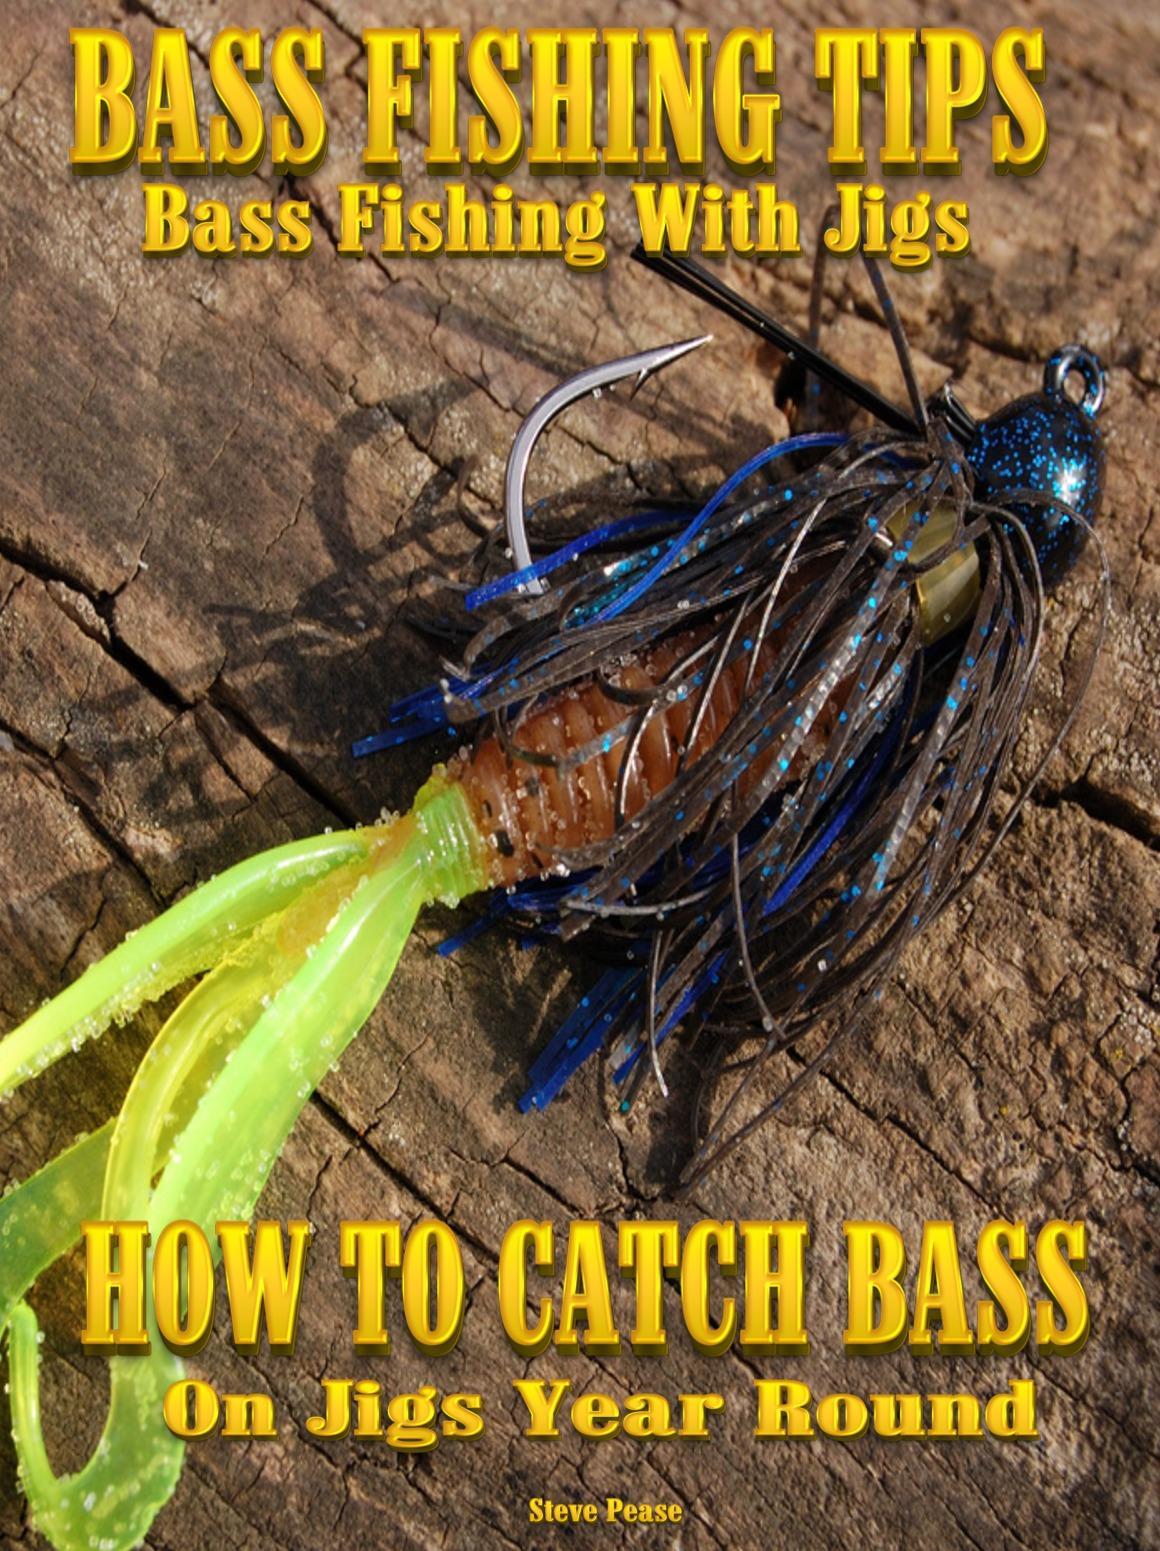 BASS FISHING WITH JIGS